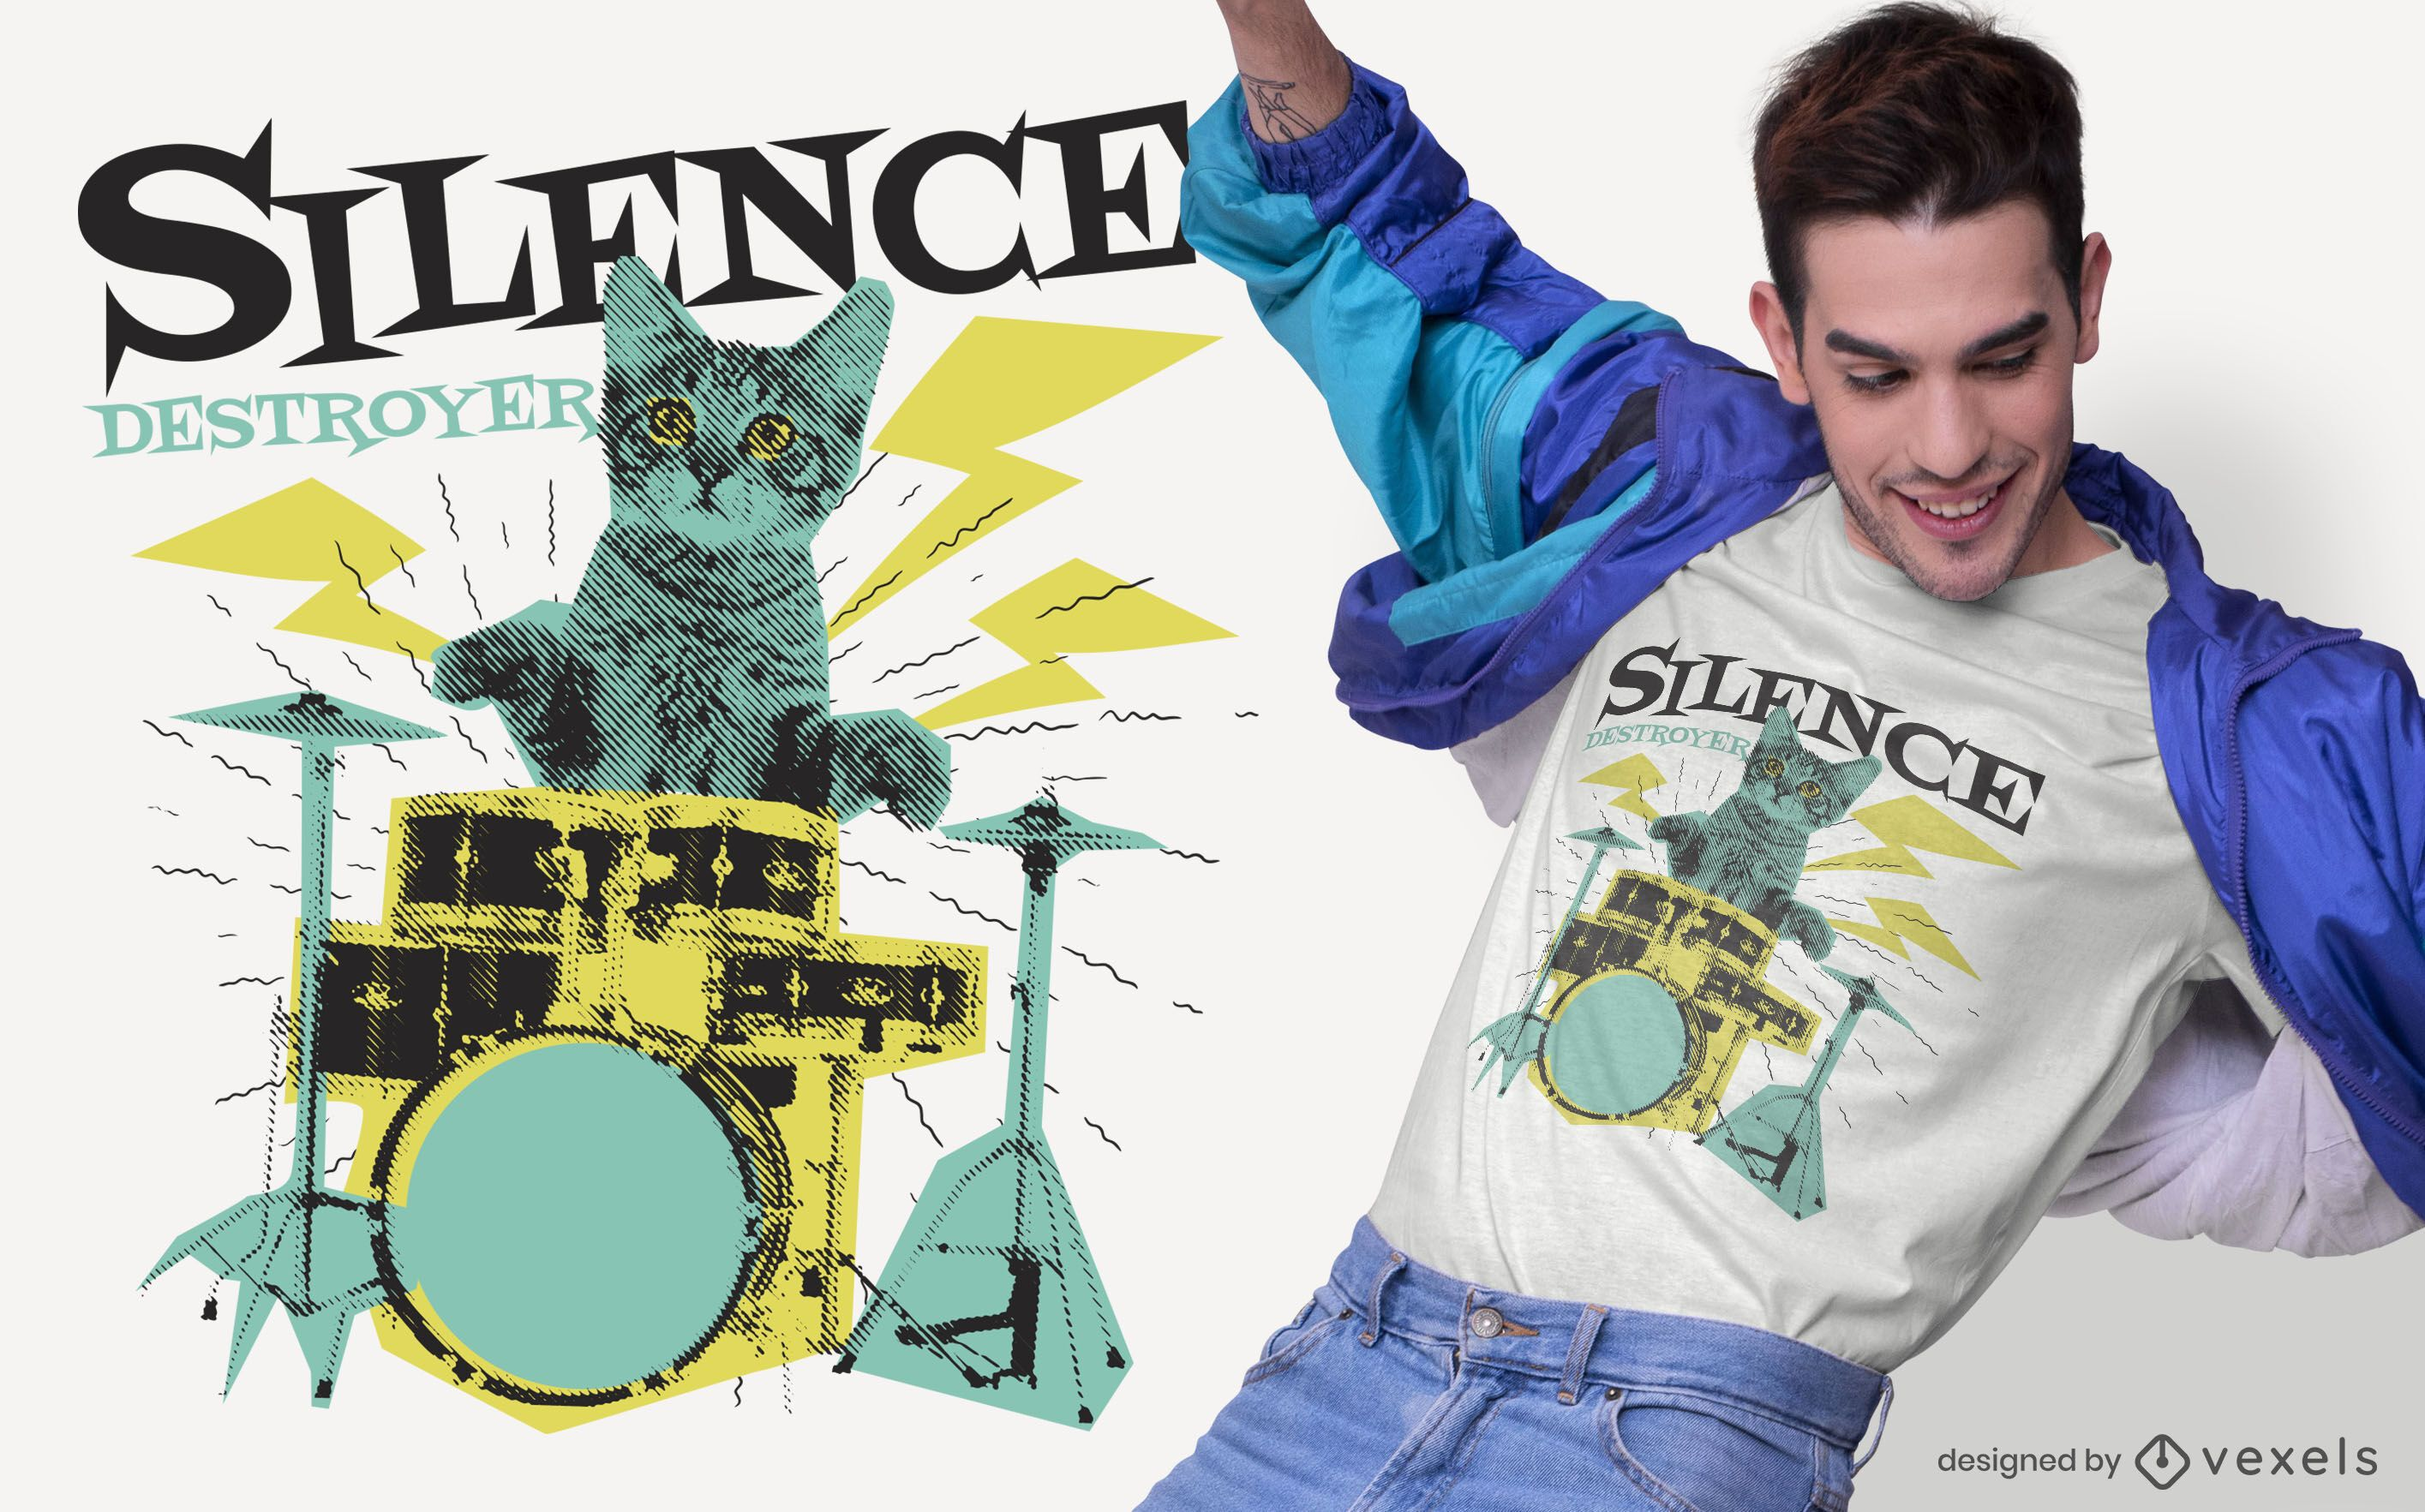 Diseño de camiseta de gato destructor de silencio.